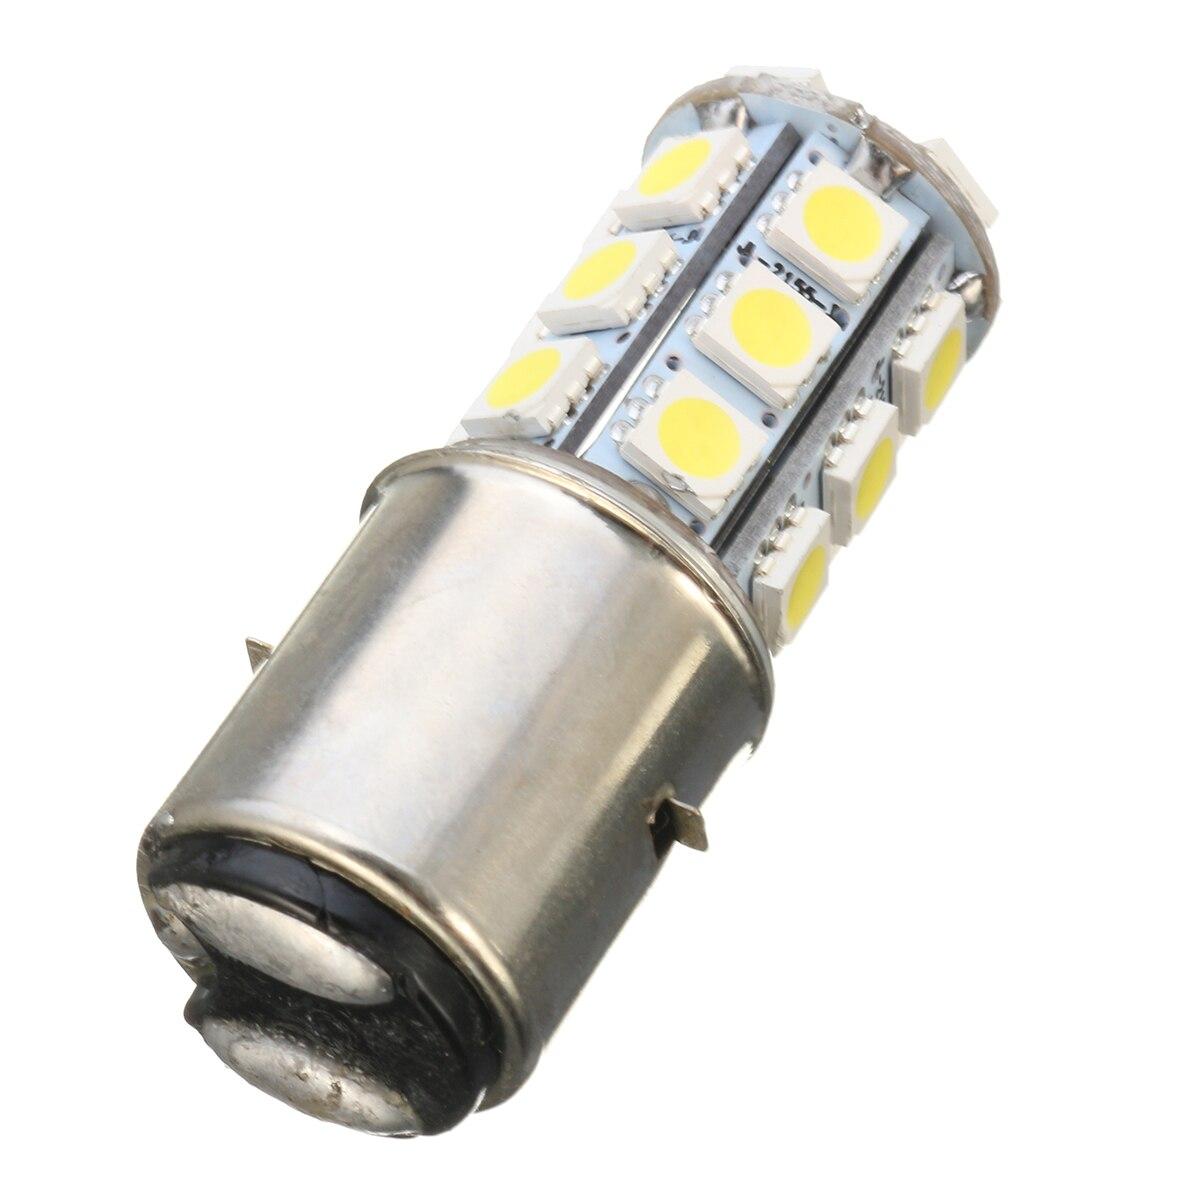 BA20D 12V H6 24 LED SMD Motorcycle Moped ATV PIT Headlight Bulb 6000K Motorbike Front Passing Light